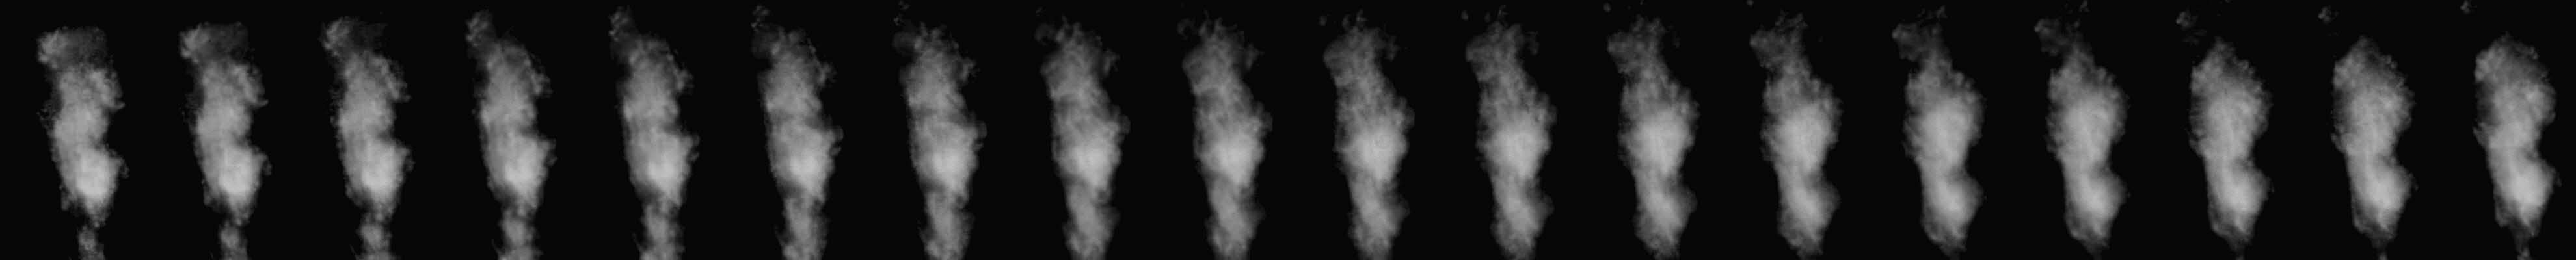 Smokeburst-gray_h18.jpg